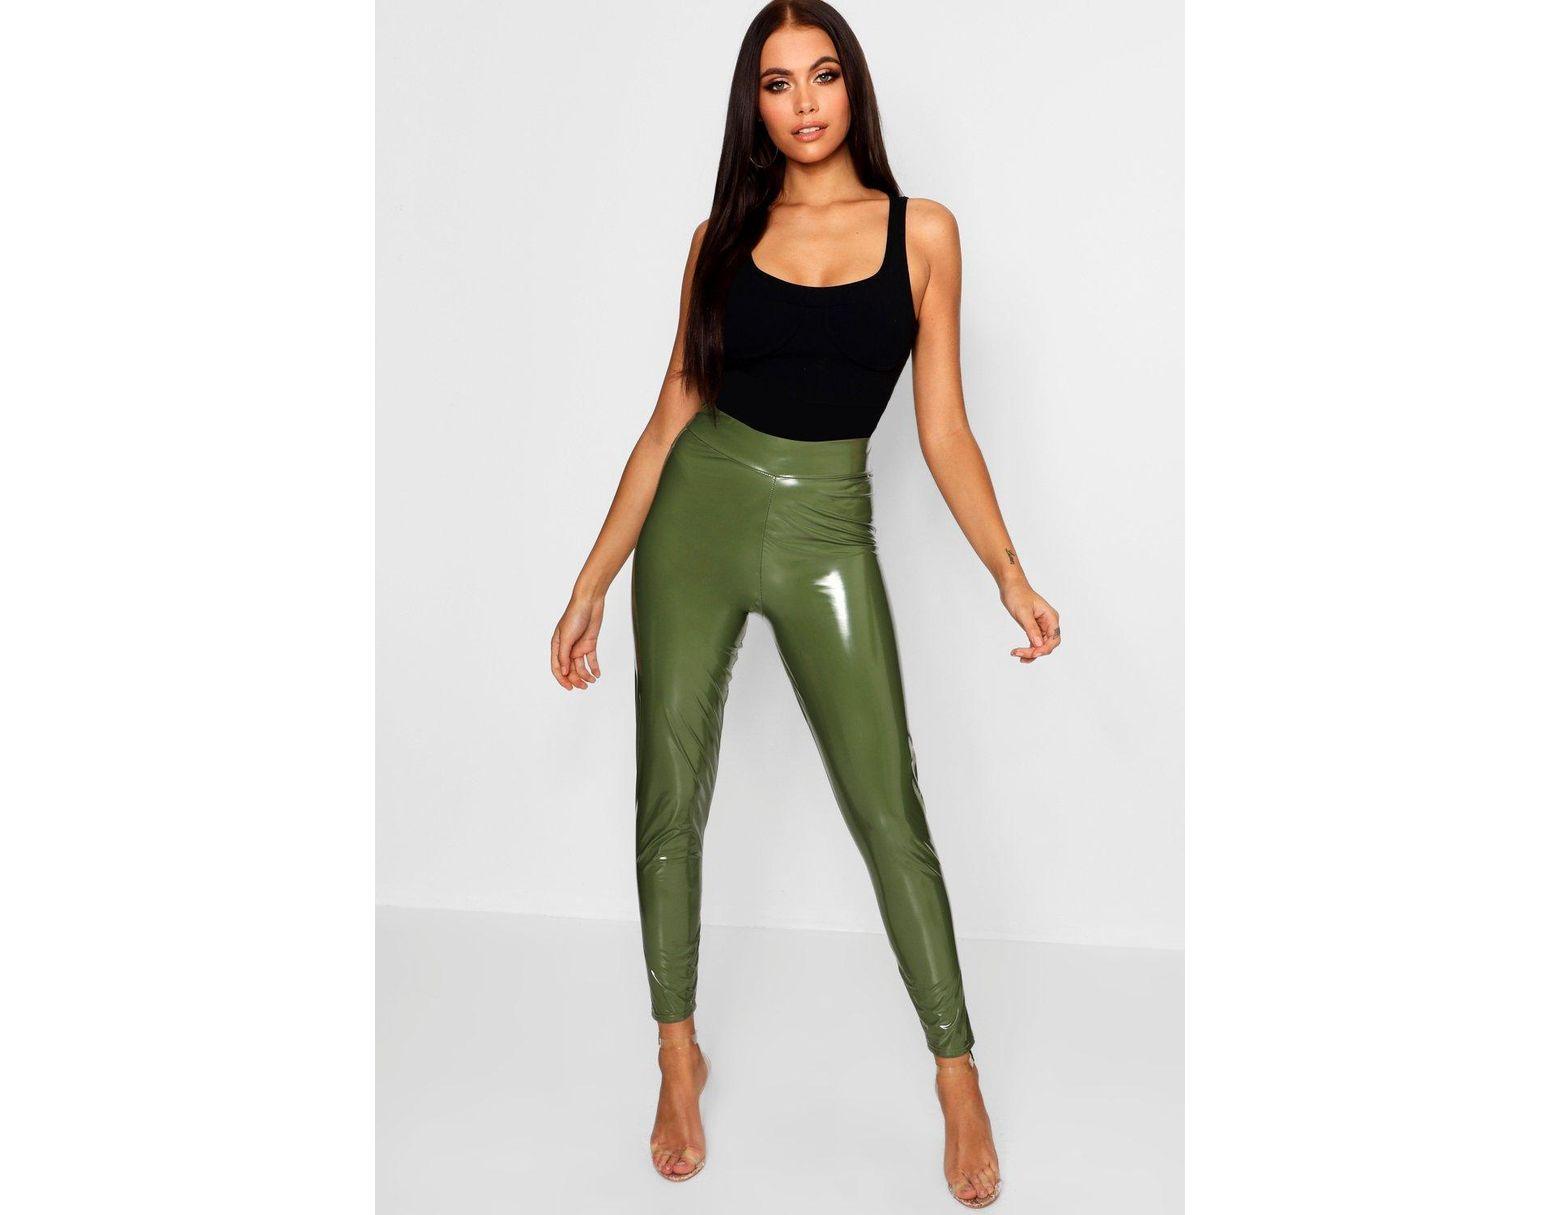 e85d4fd51b0aa2 Boohoo Vinyl High Waist Leggings in Green - Lyst